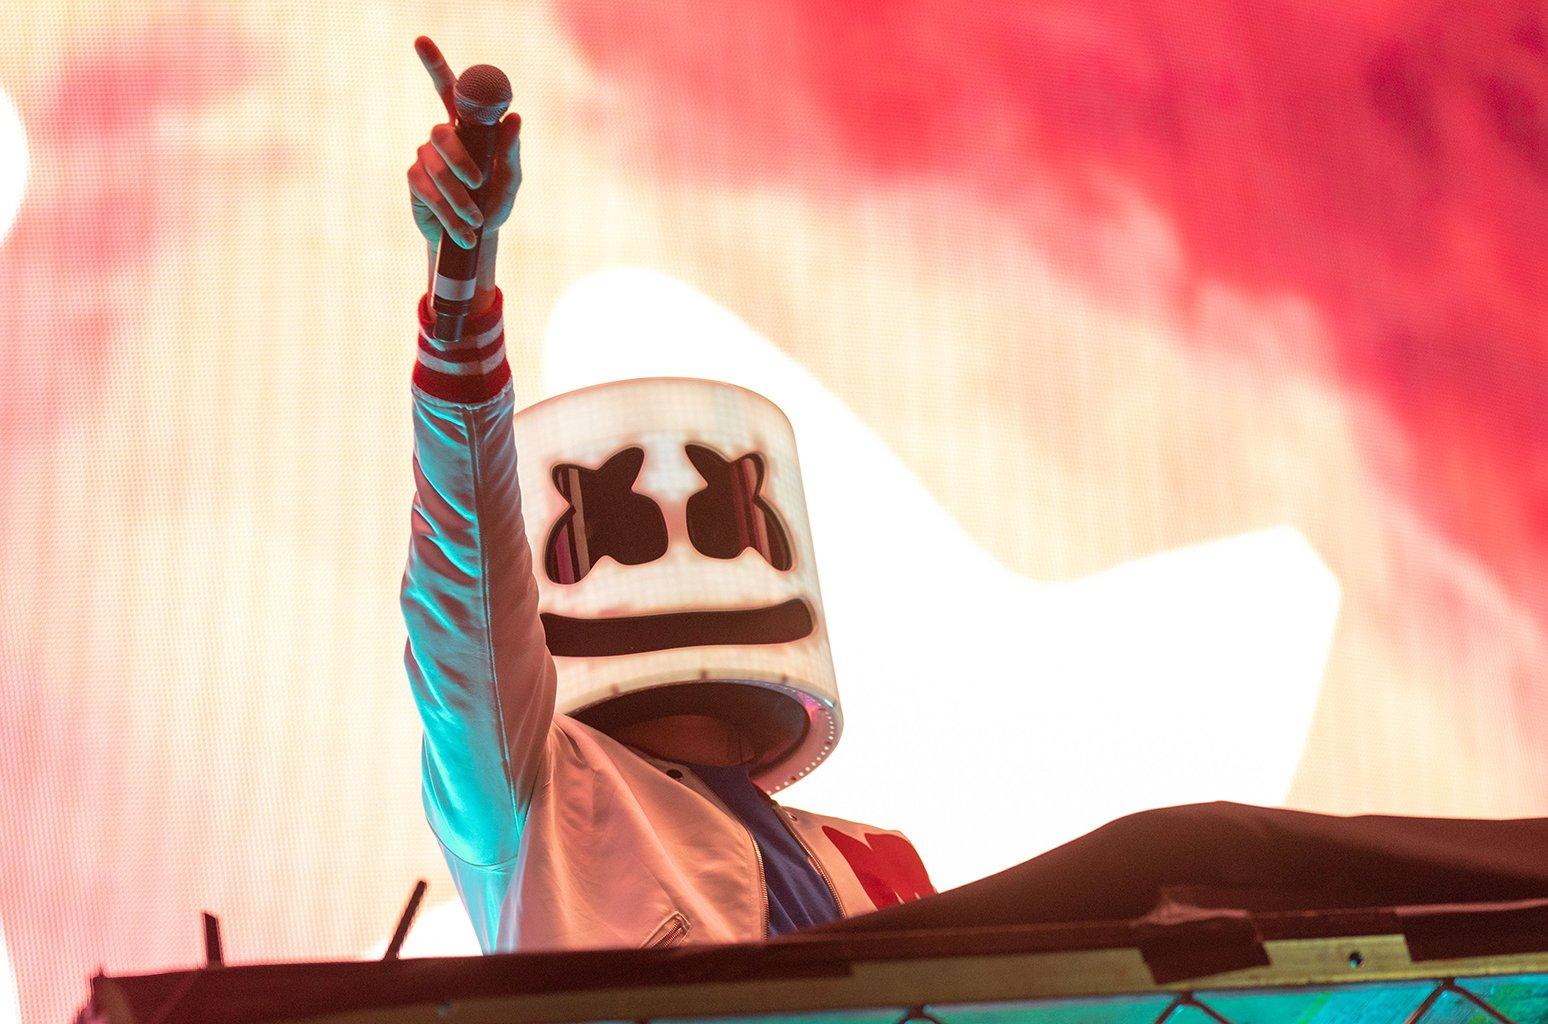 Marshmello's 'Joytime II' has arrived https://t.co/2fIQjSTYym https://t.co/JUZ0pUSPhN